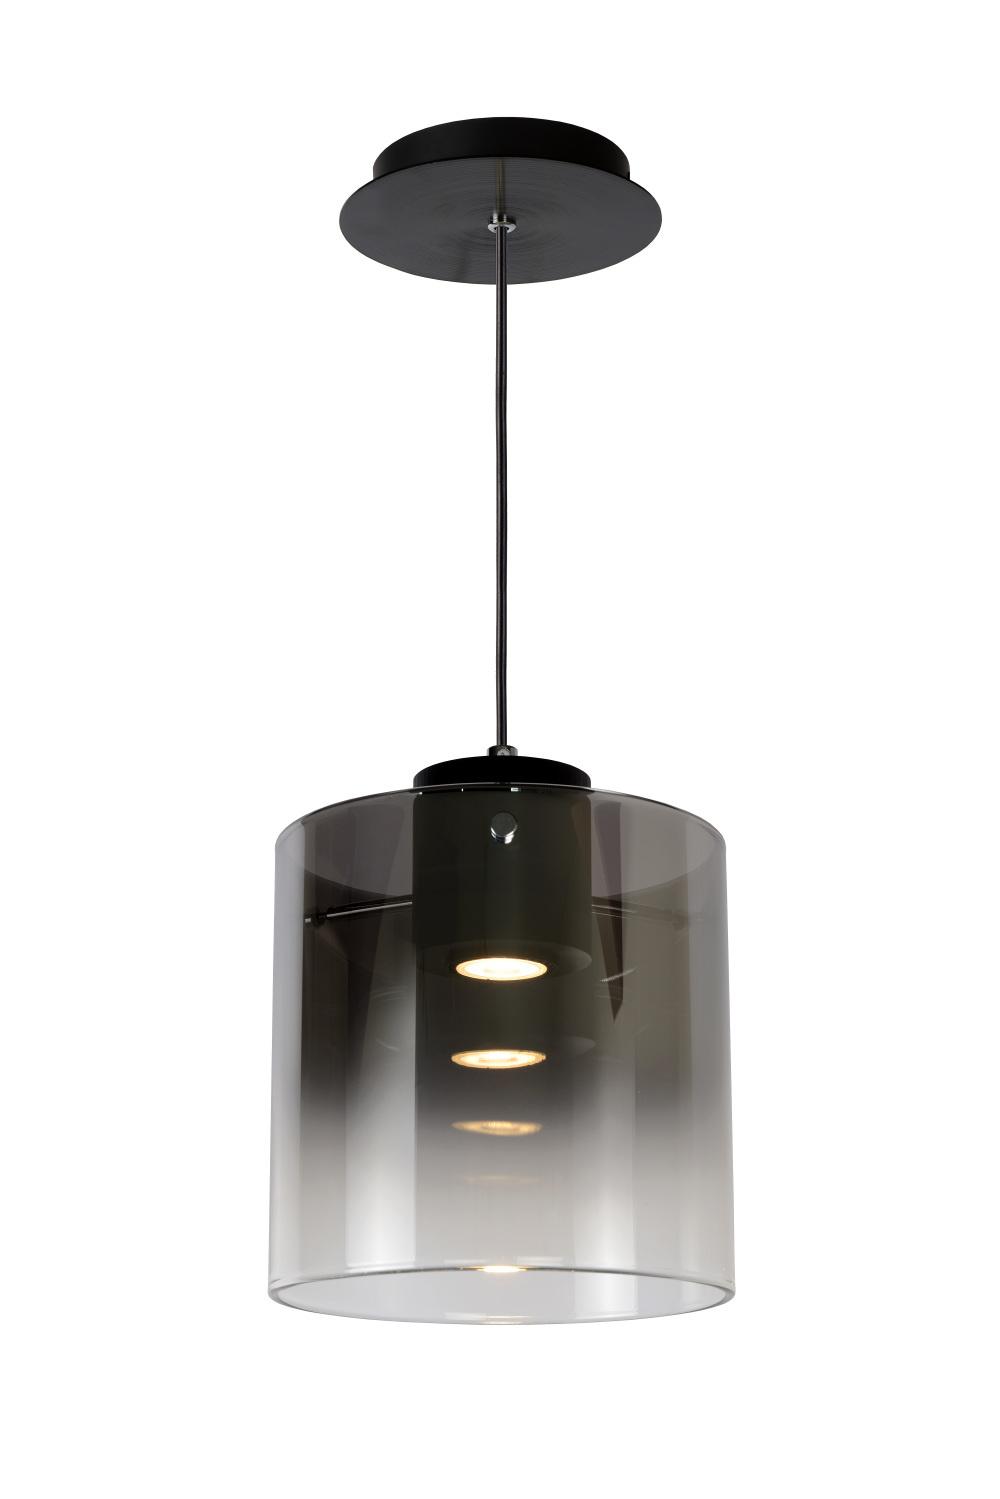 Lucide OWINO Hanglamp 1x GU10 LED Ø 20cm Zwart/Fumé Glas